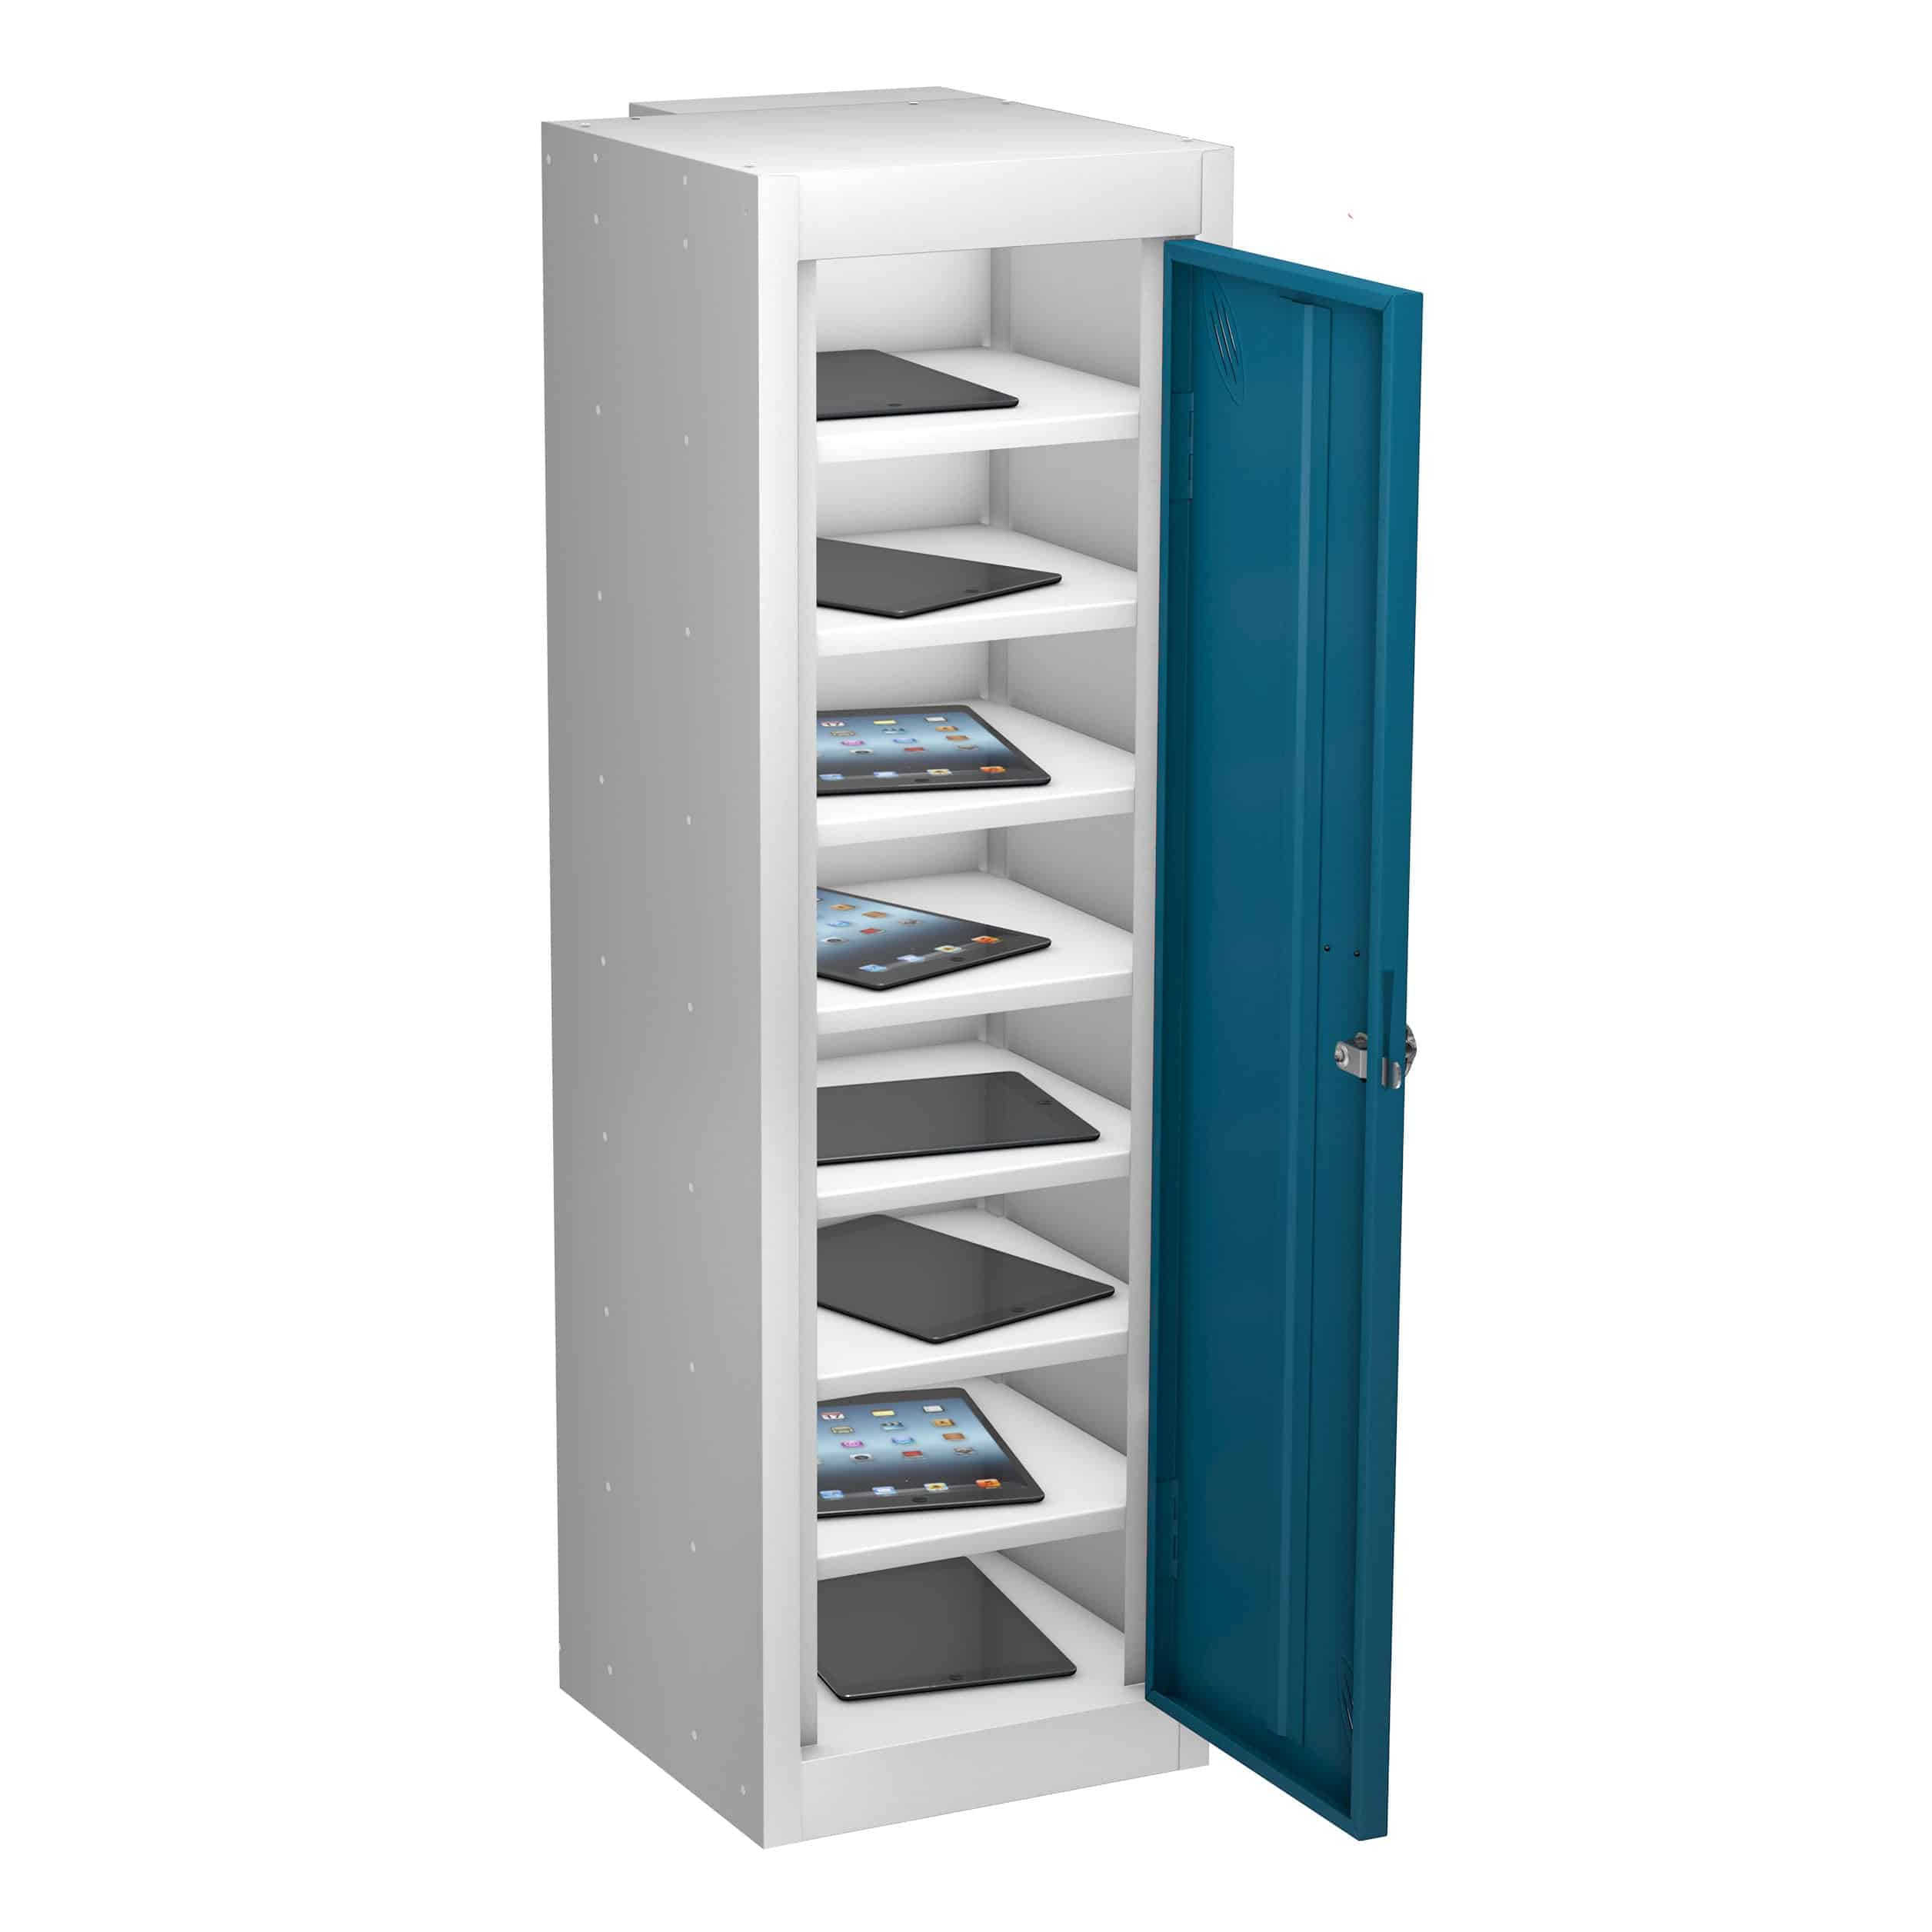 TABbox 8 Shelf Storage Lockers